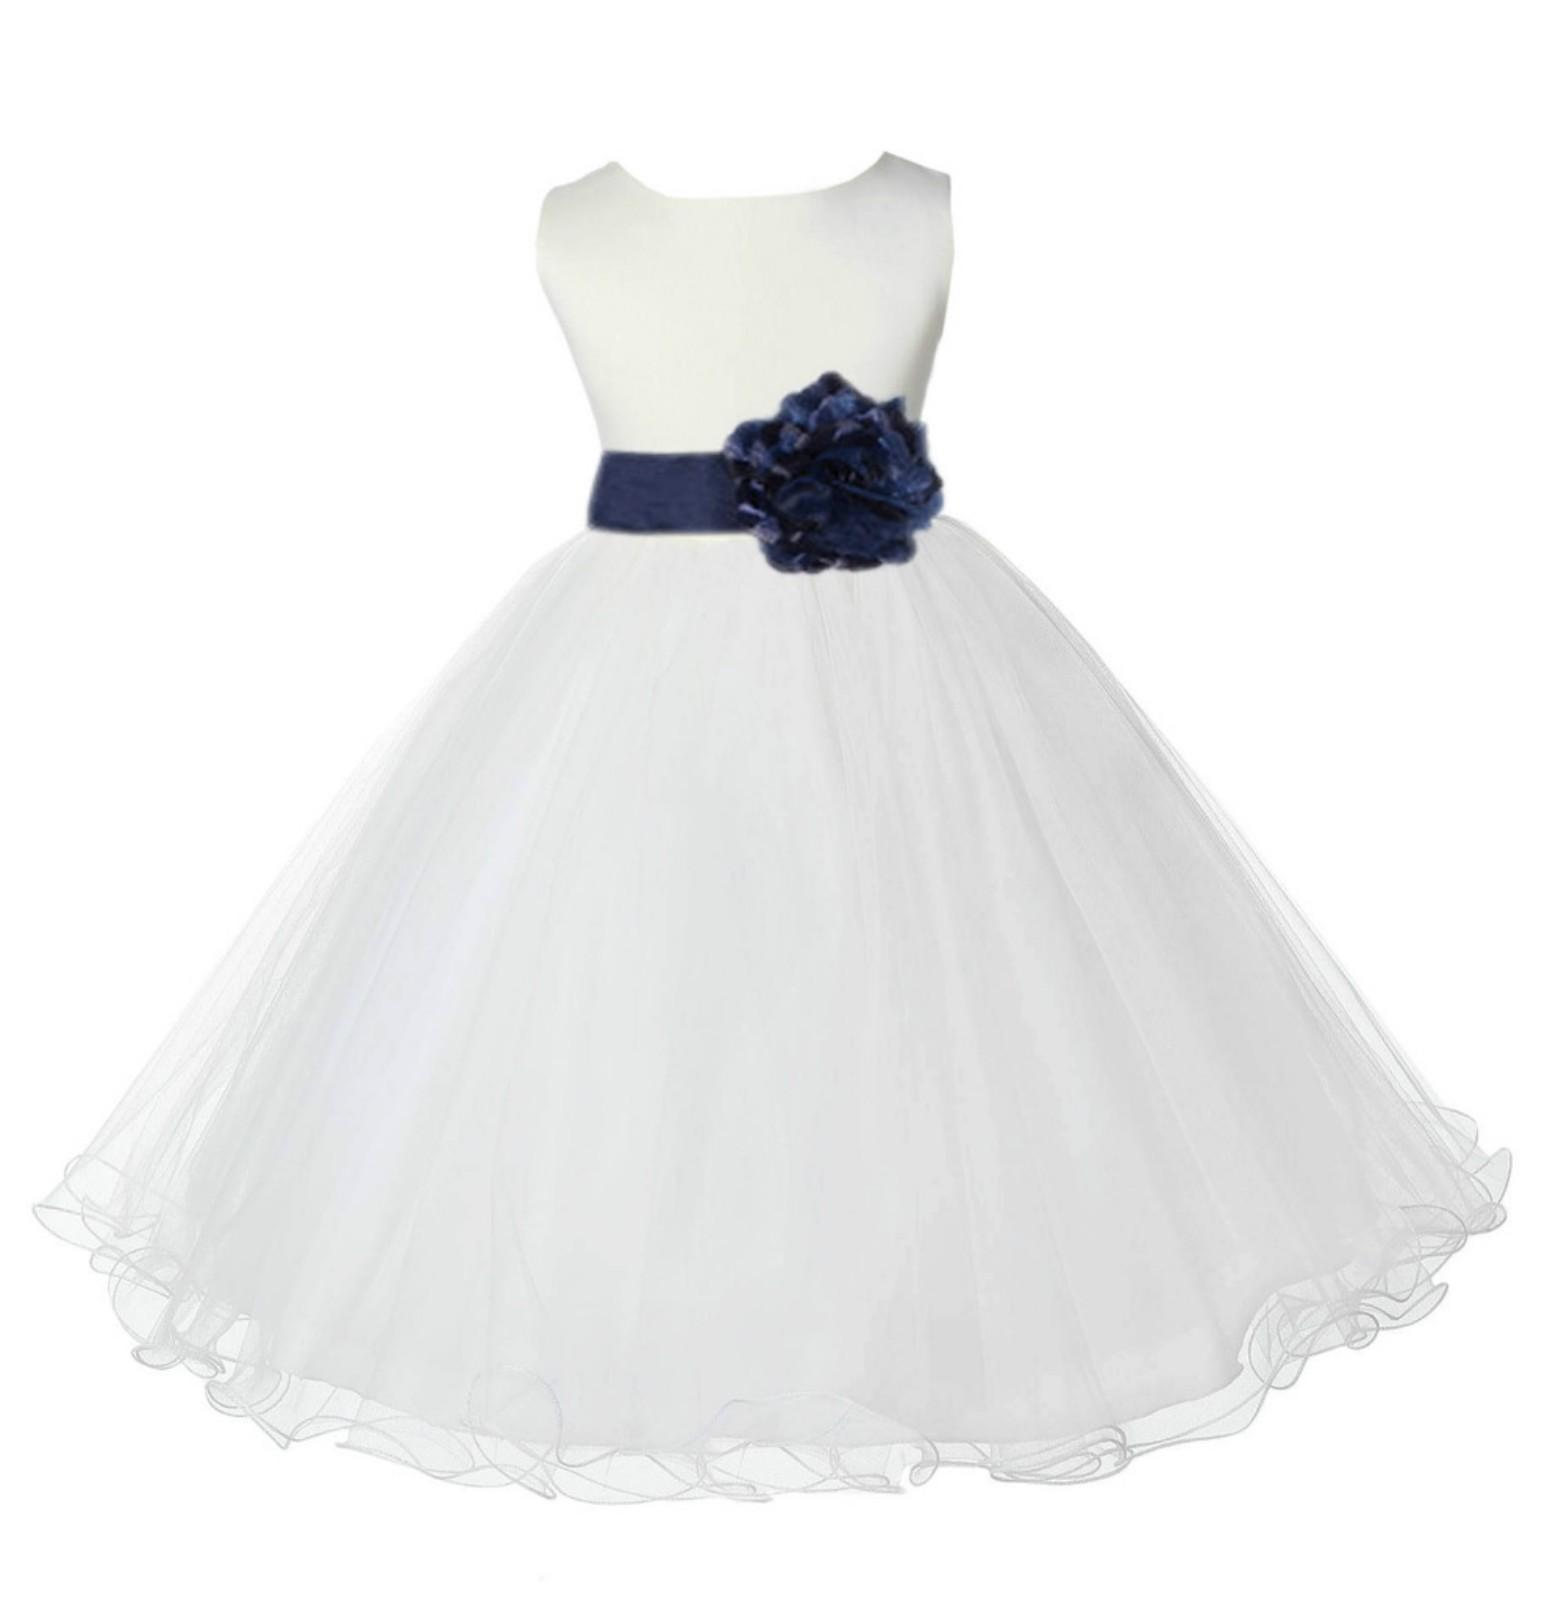 Ivory/Marine Tulle Rattail Edge Flower Girl Dress Pageant Recital 829S